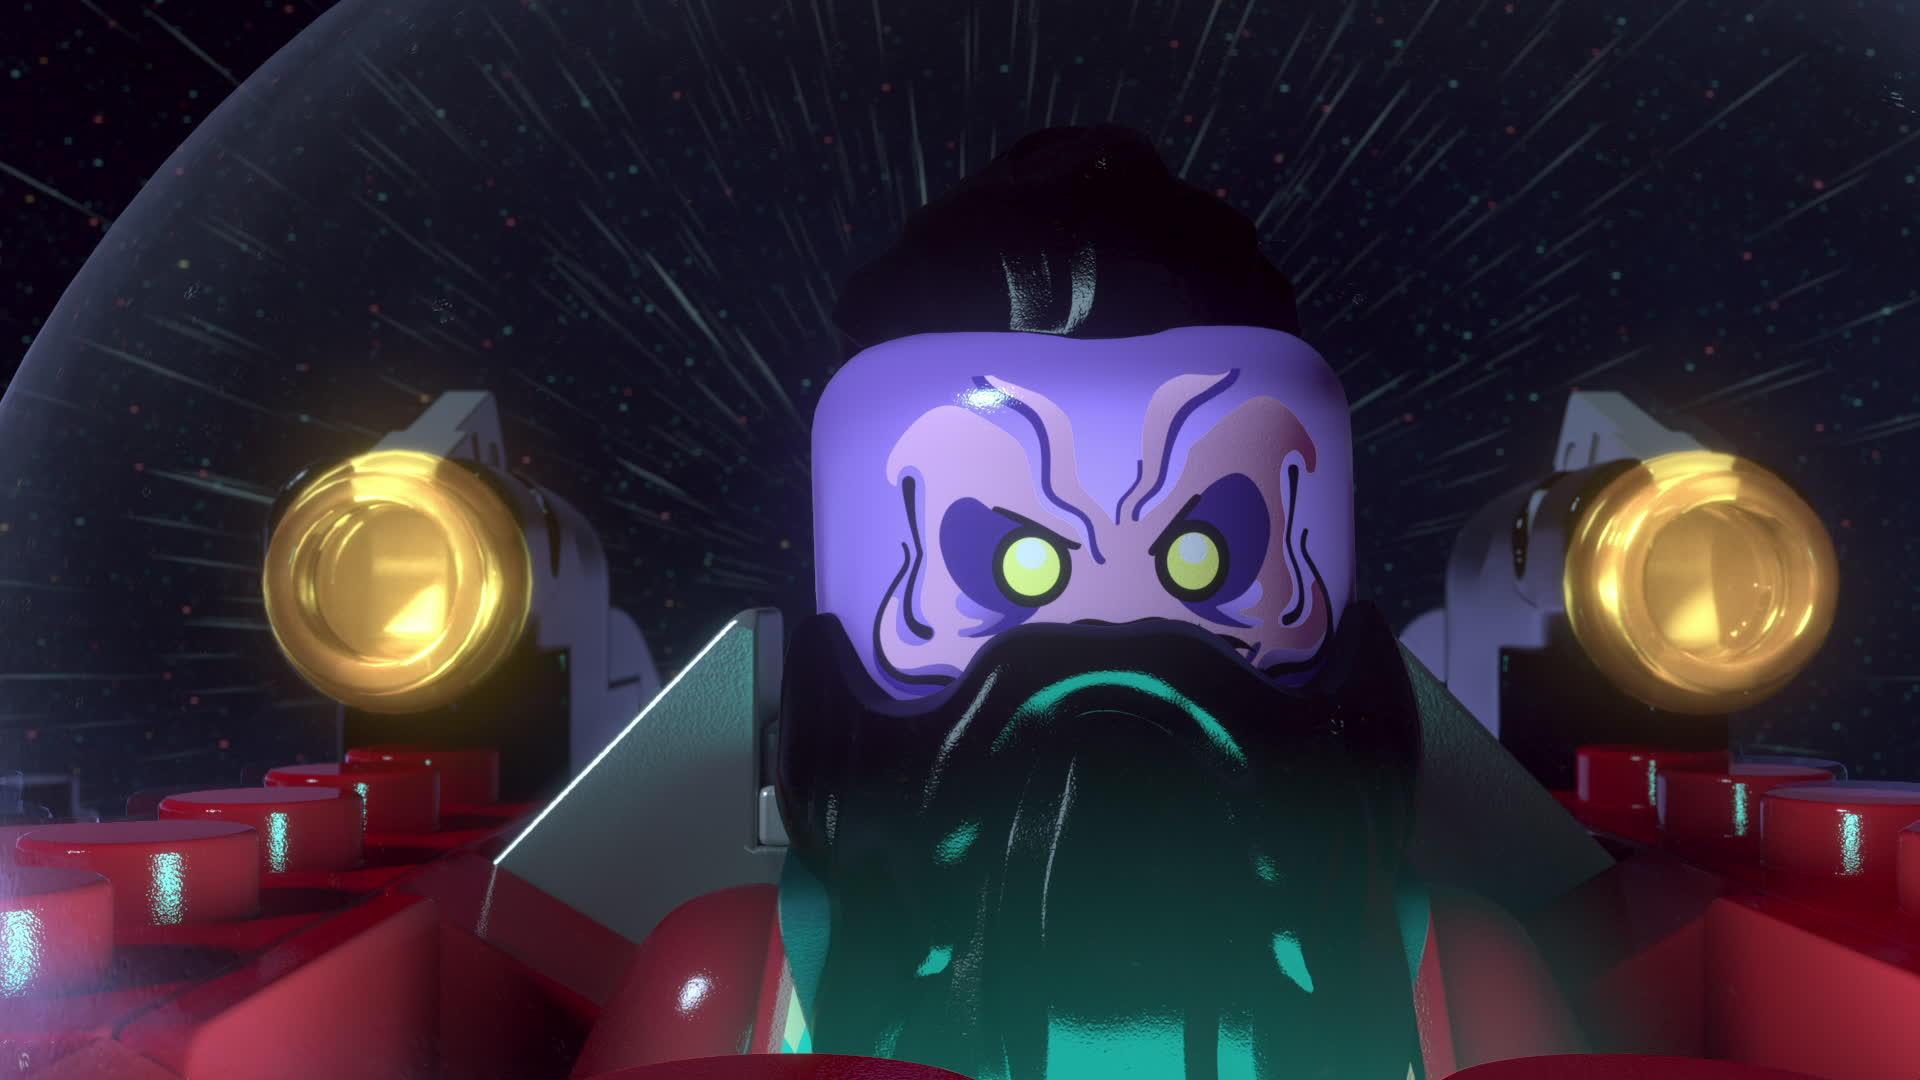 Part 1: The Build Stone